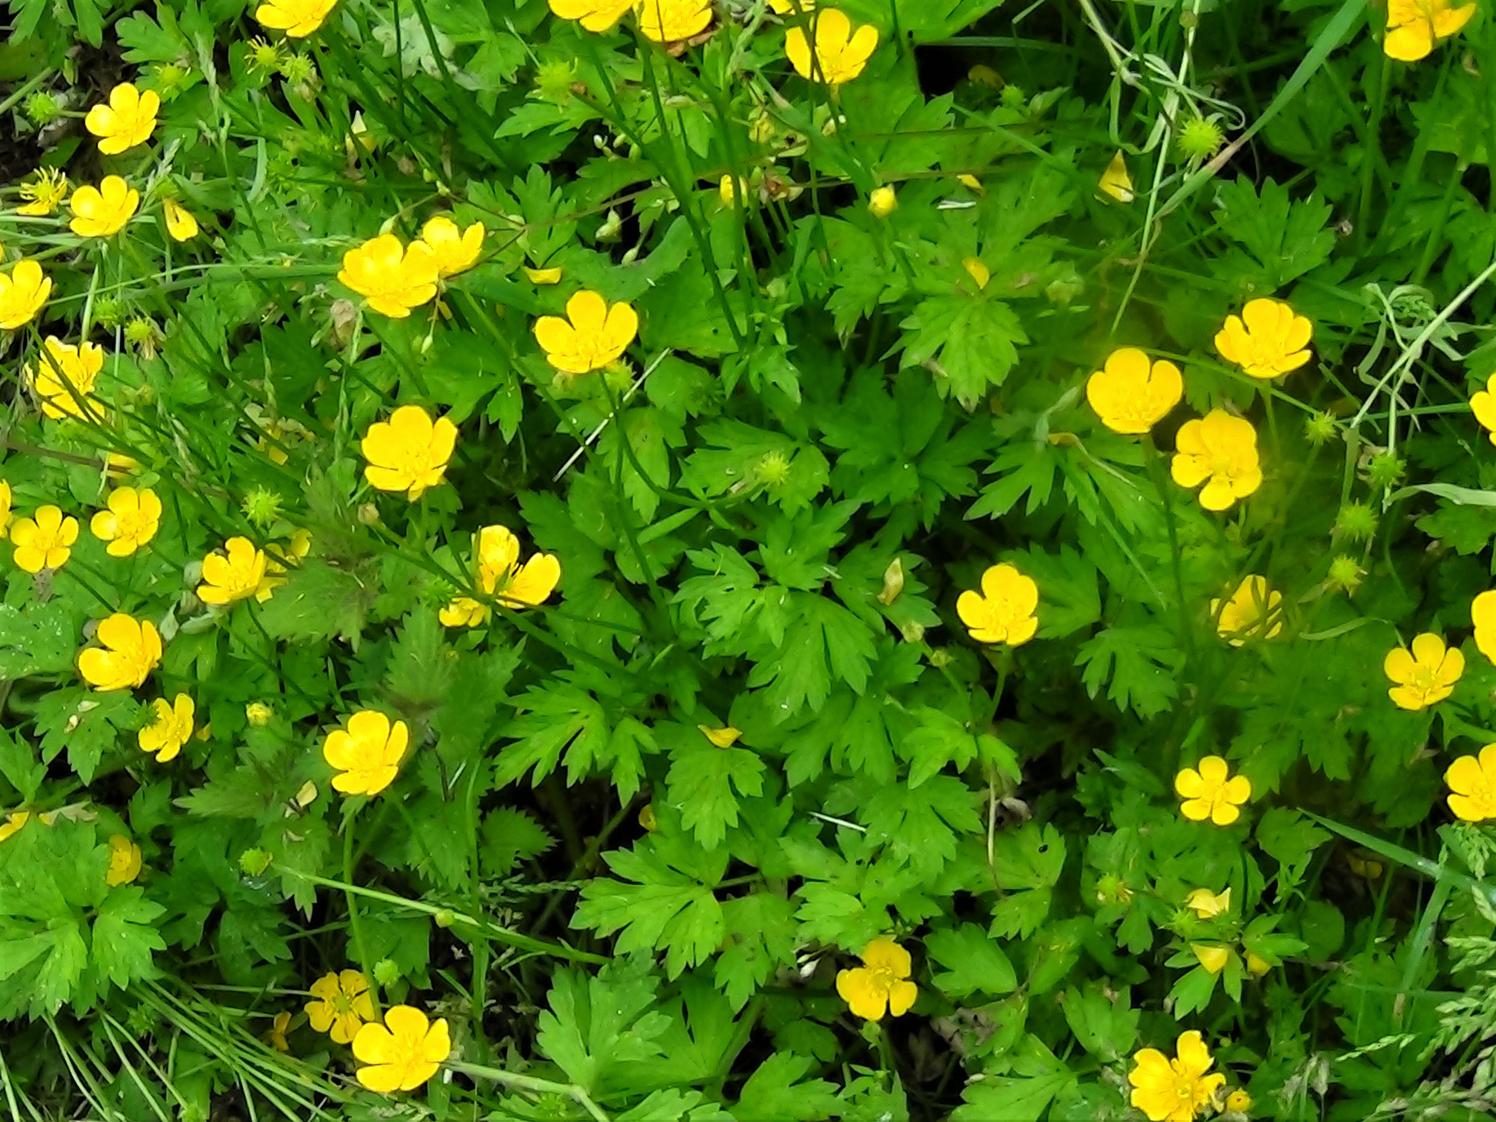 Buttercups, Ranunculus